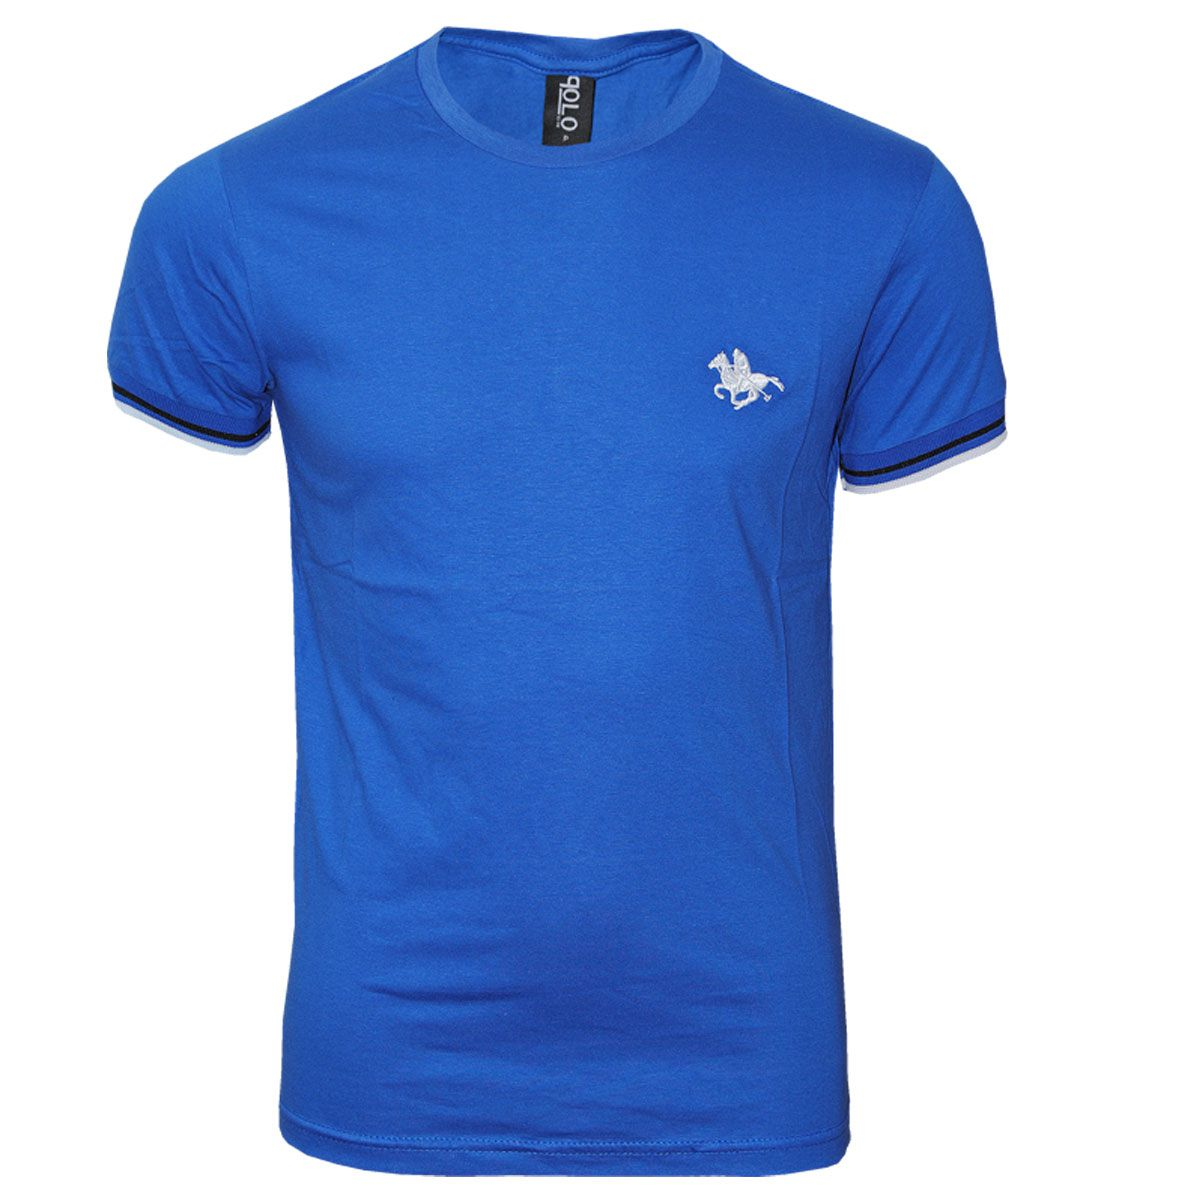 Camiseta Masculina Polo Rg518 com Punho